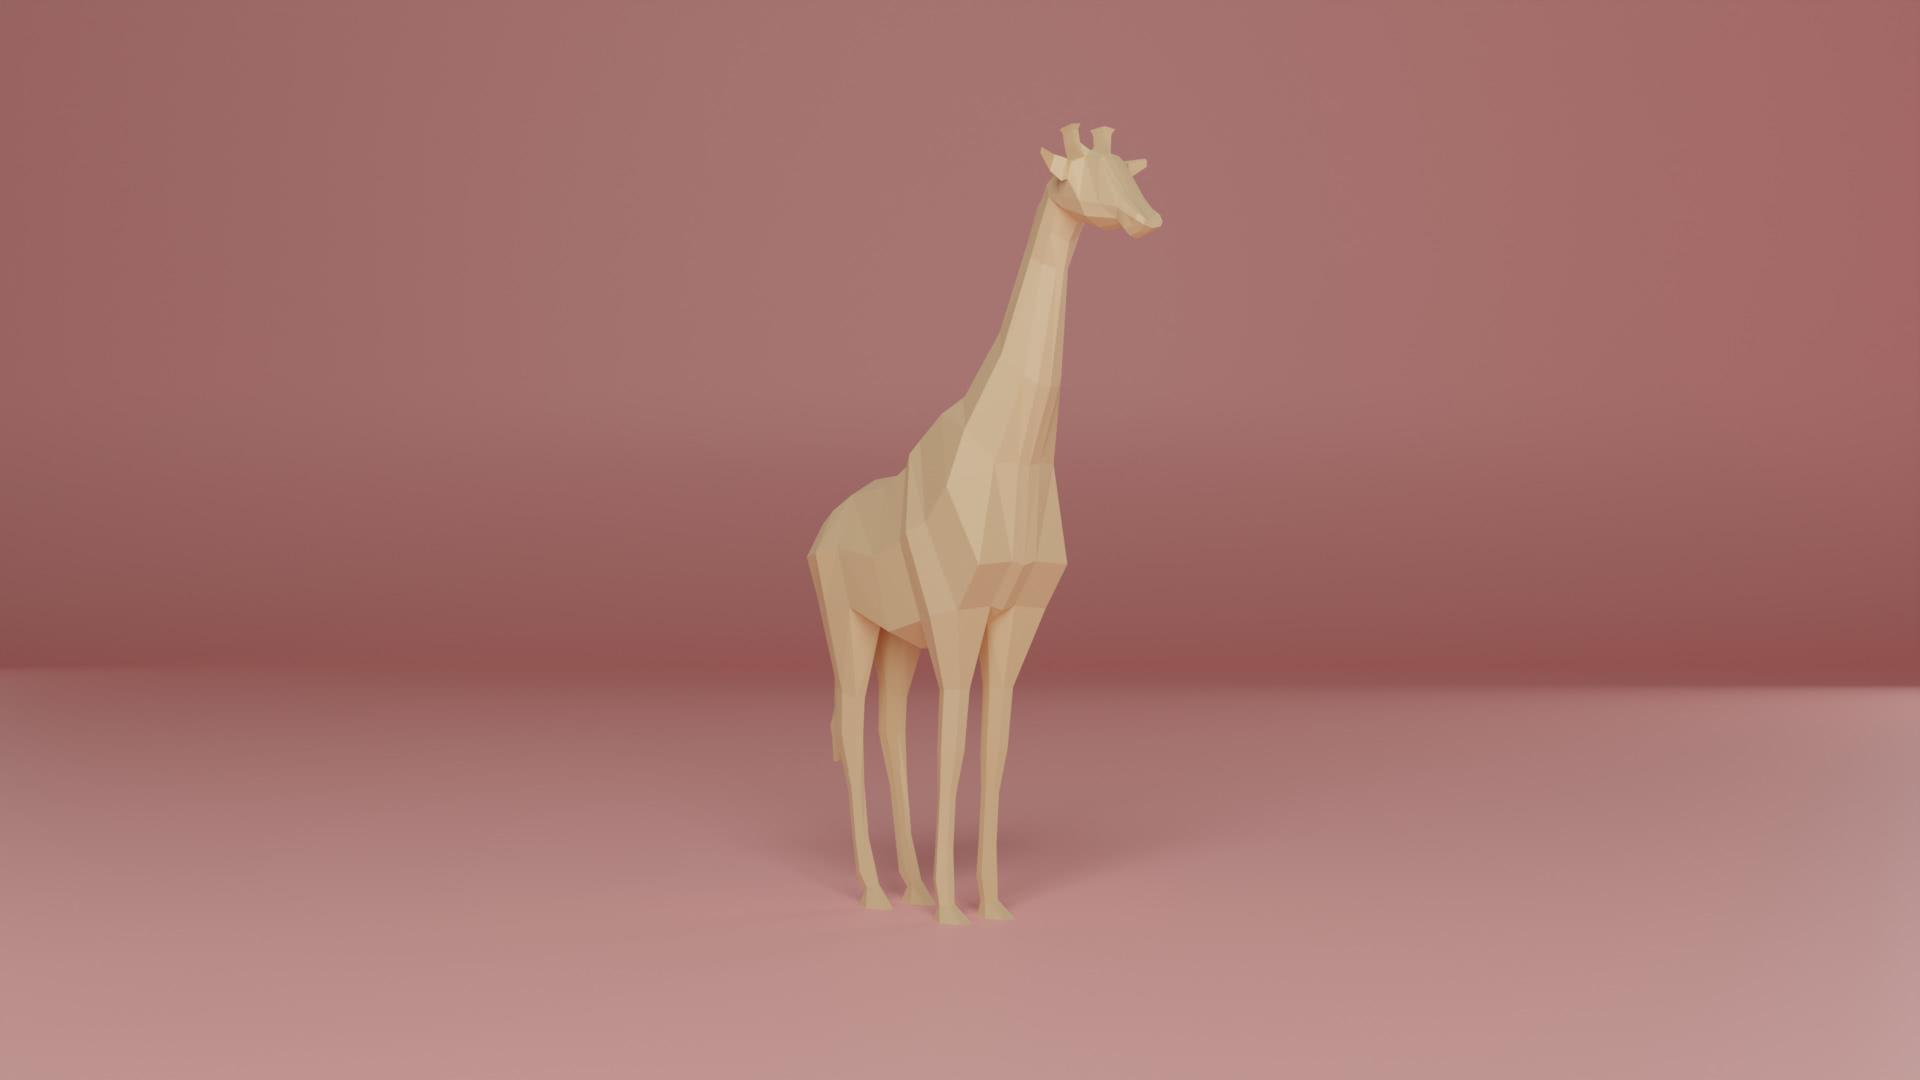 Low Poly 3D-Modell Giraffe